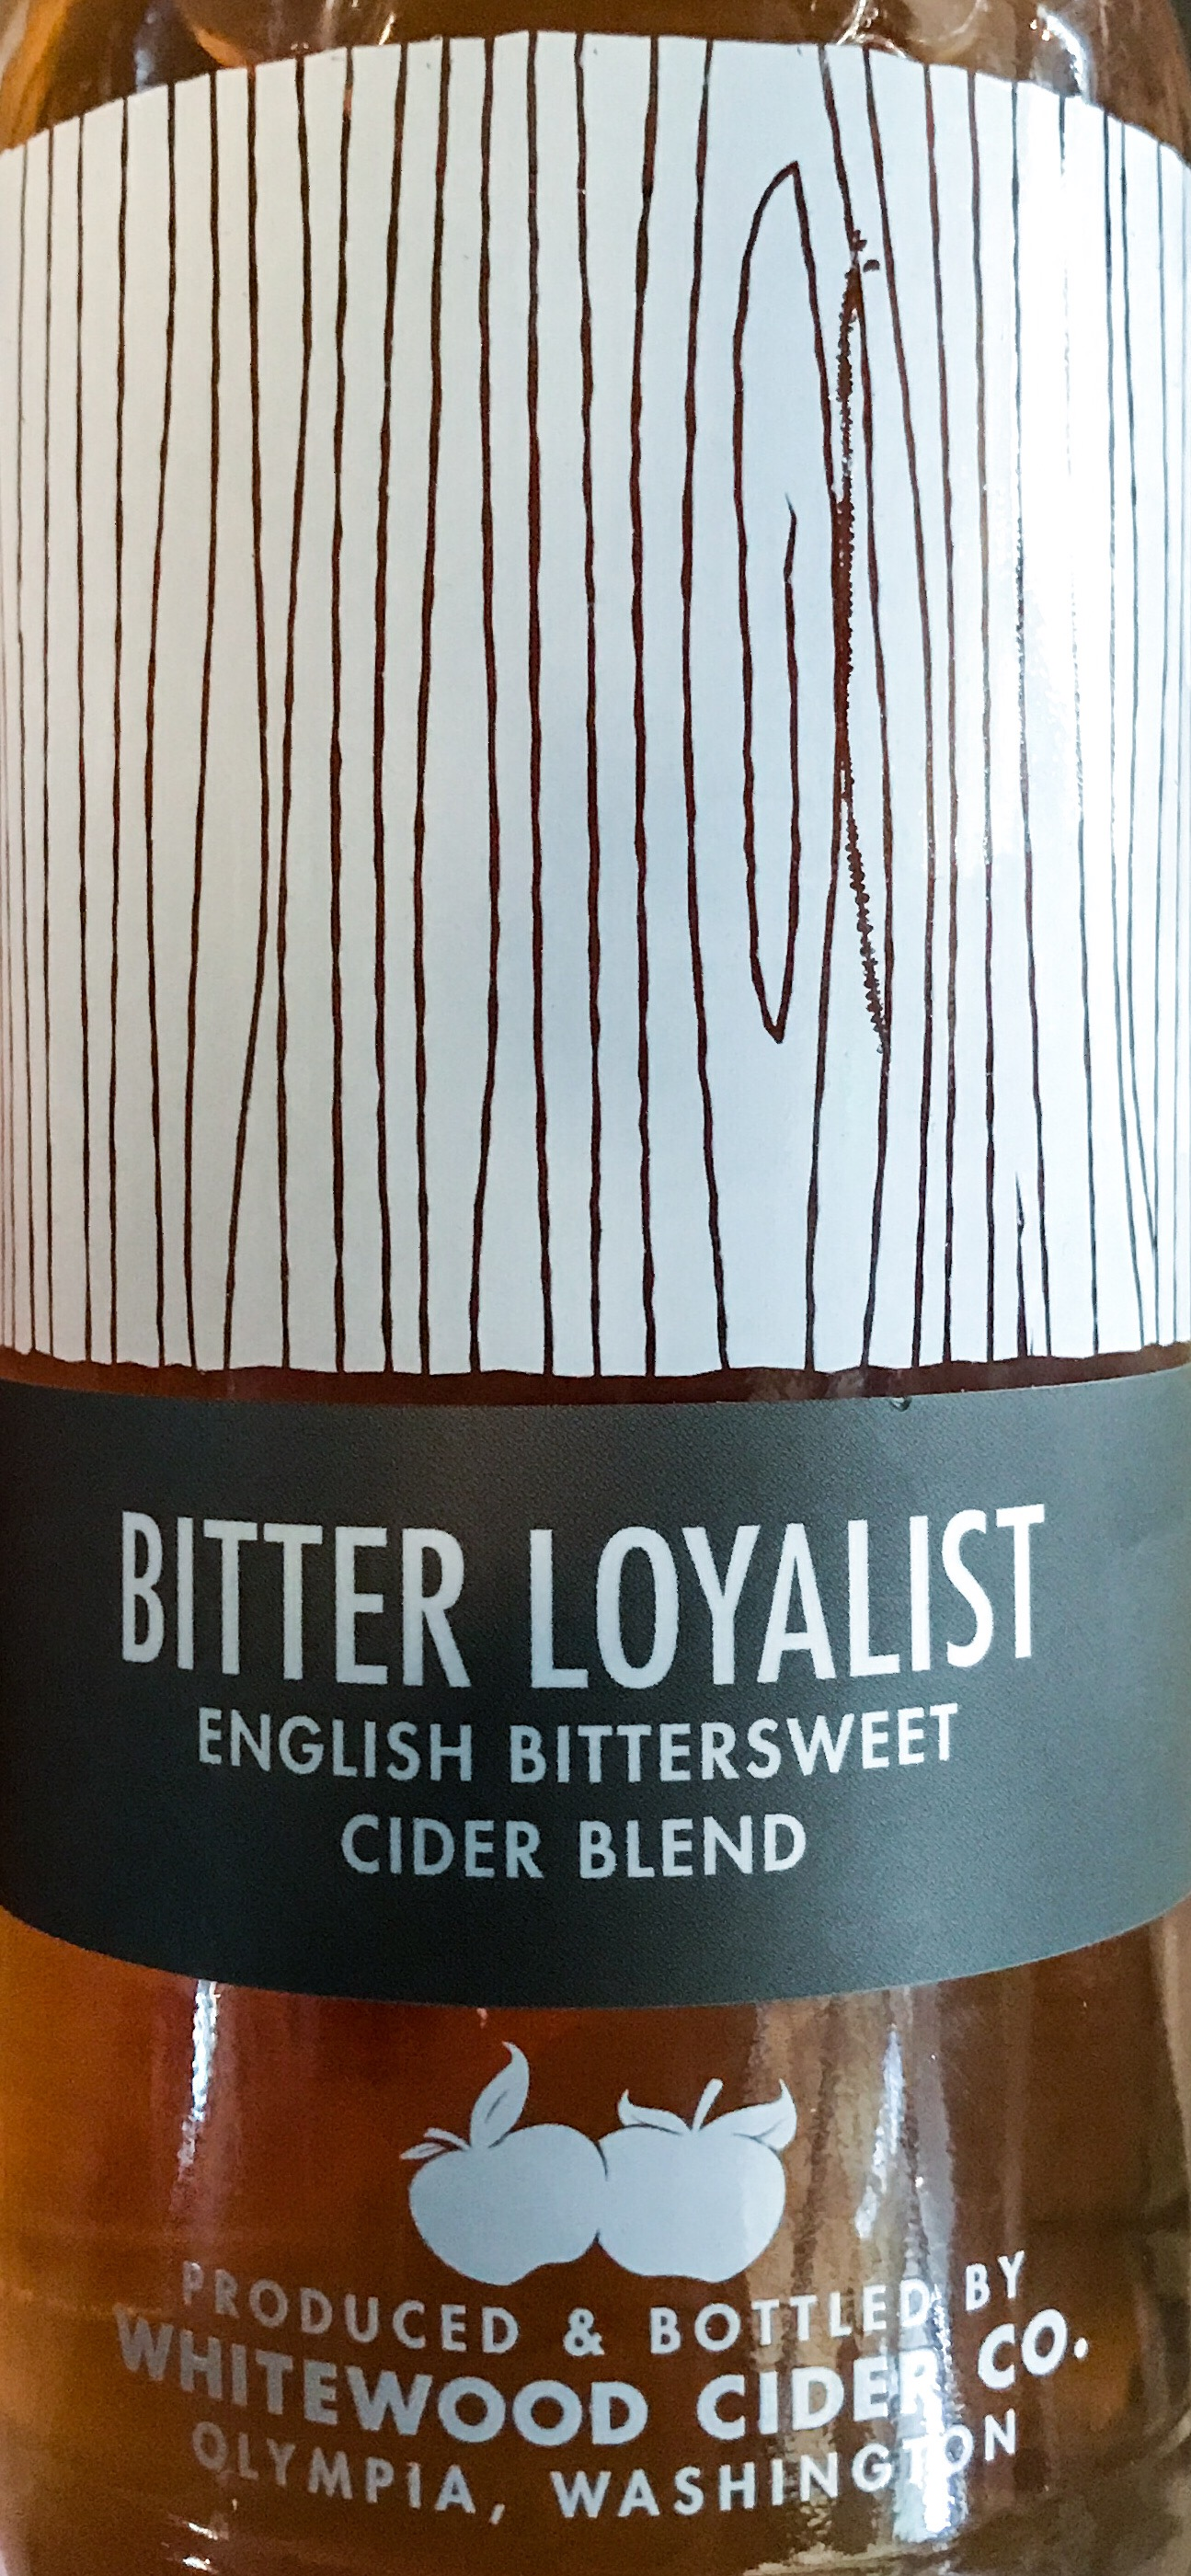 Bitter Loyalist